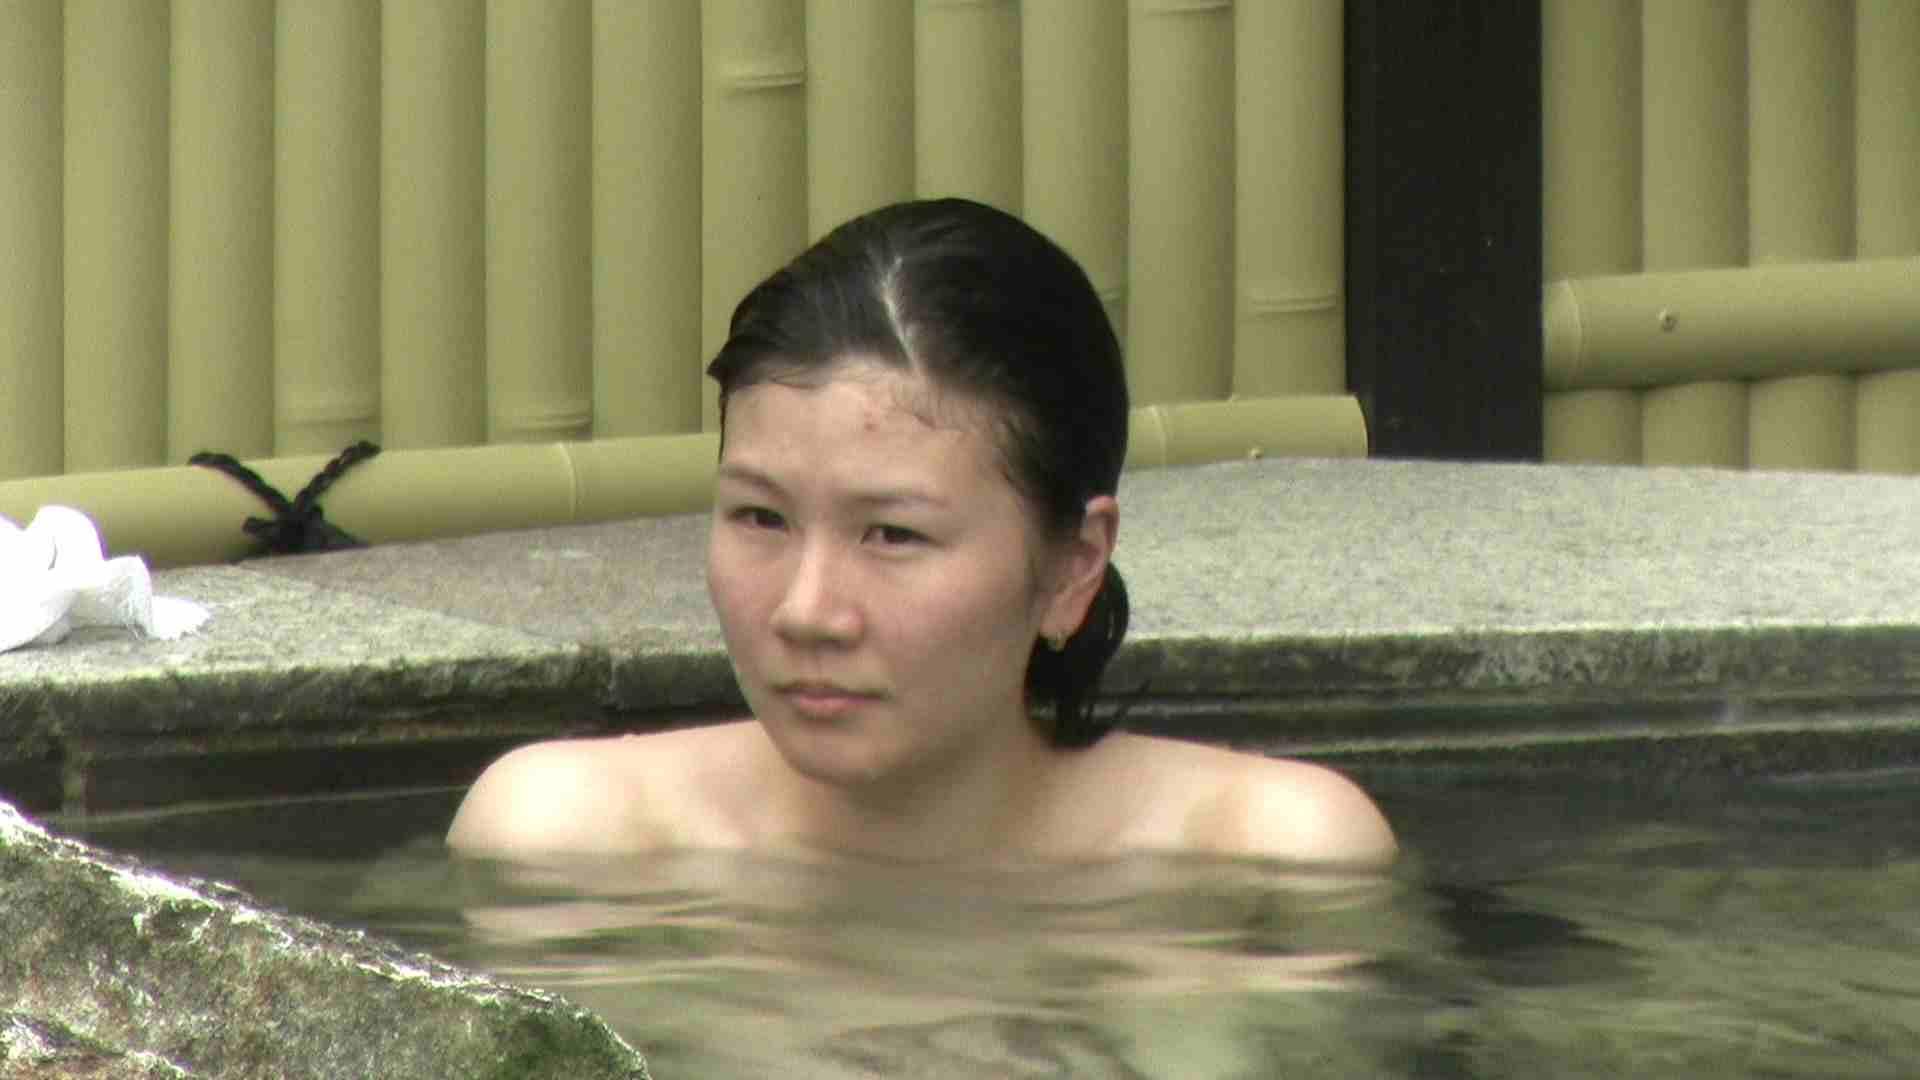 Aquaな露天風呂Vol.187 盗撮映像  99Pix 33